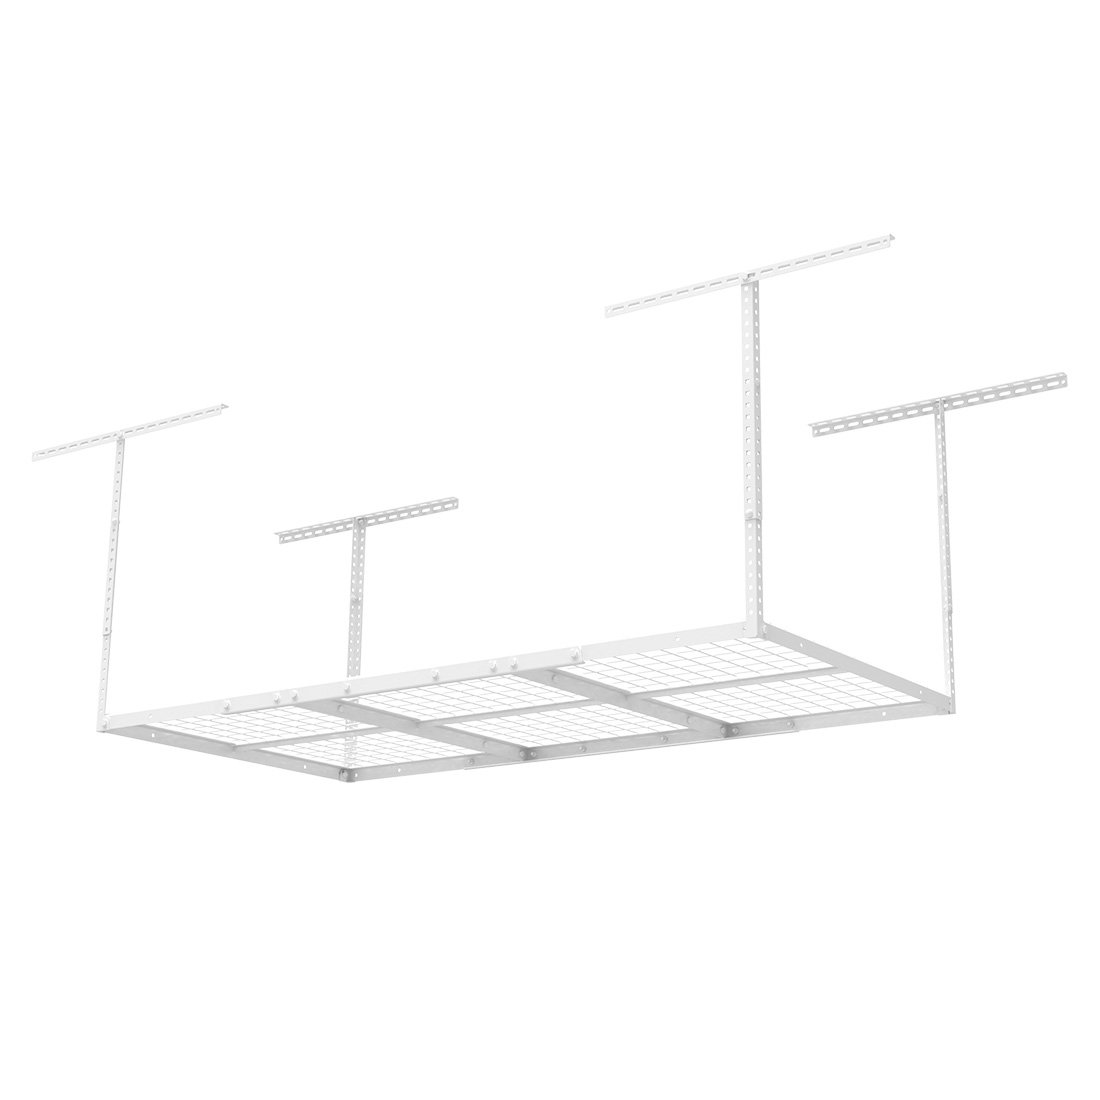 Fleximounts 3x6 Overhead Garage Storage Adjustable Ceiling